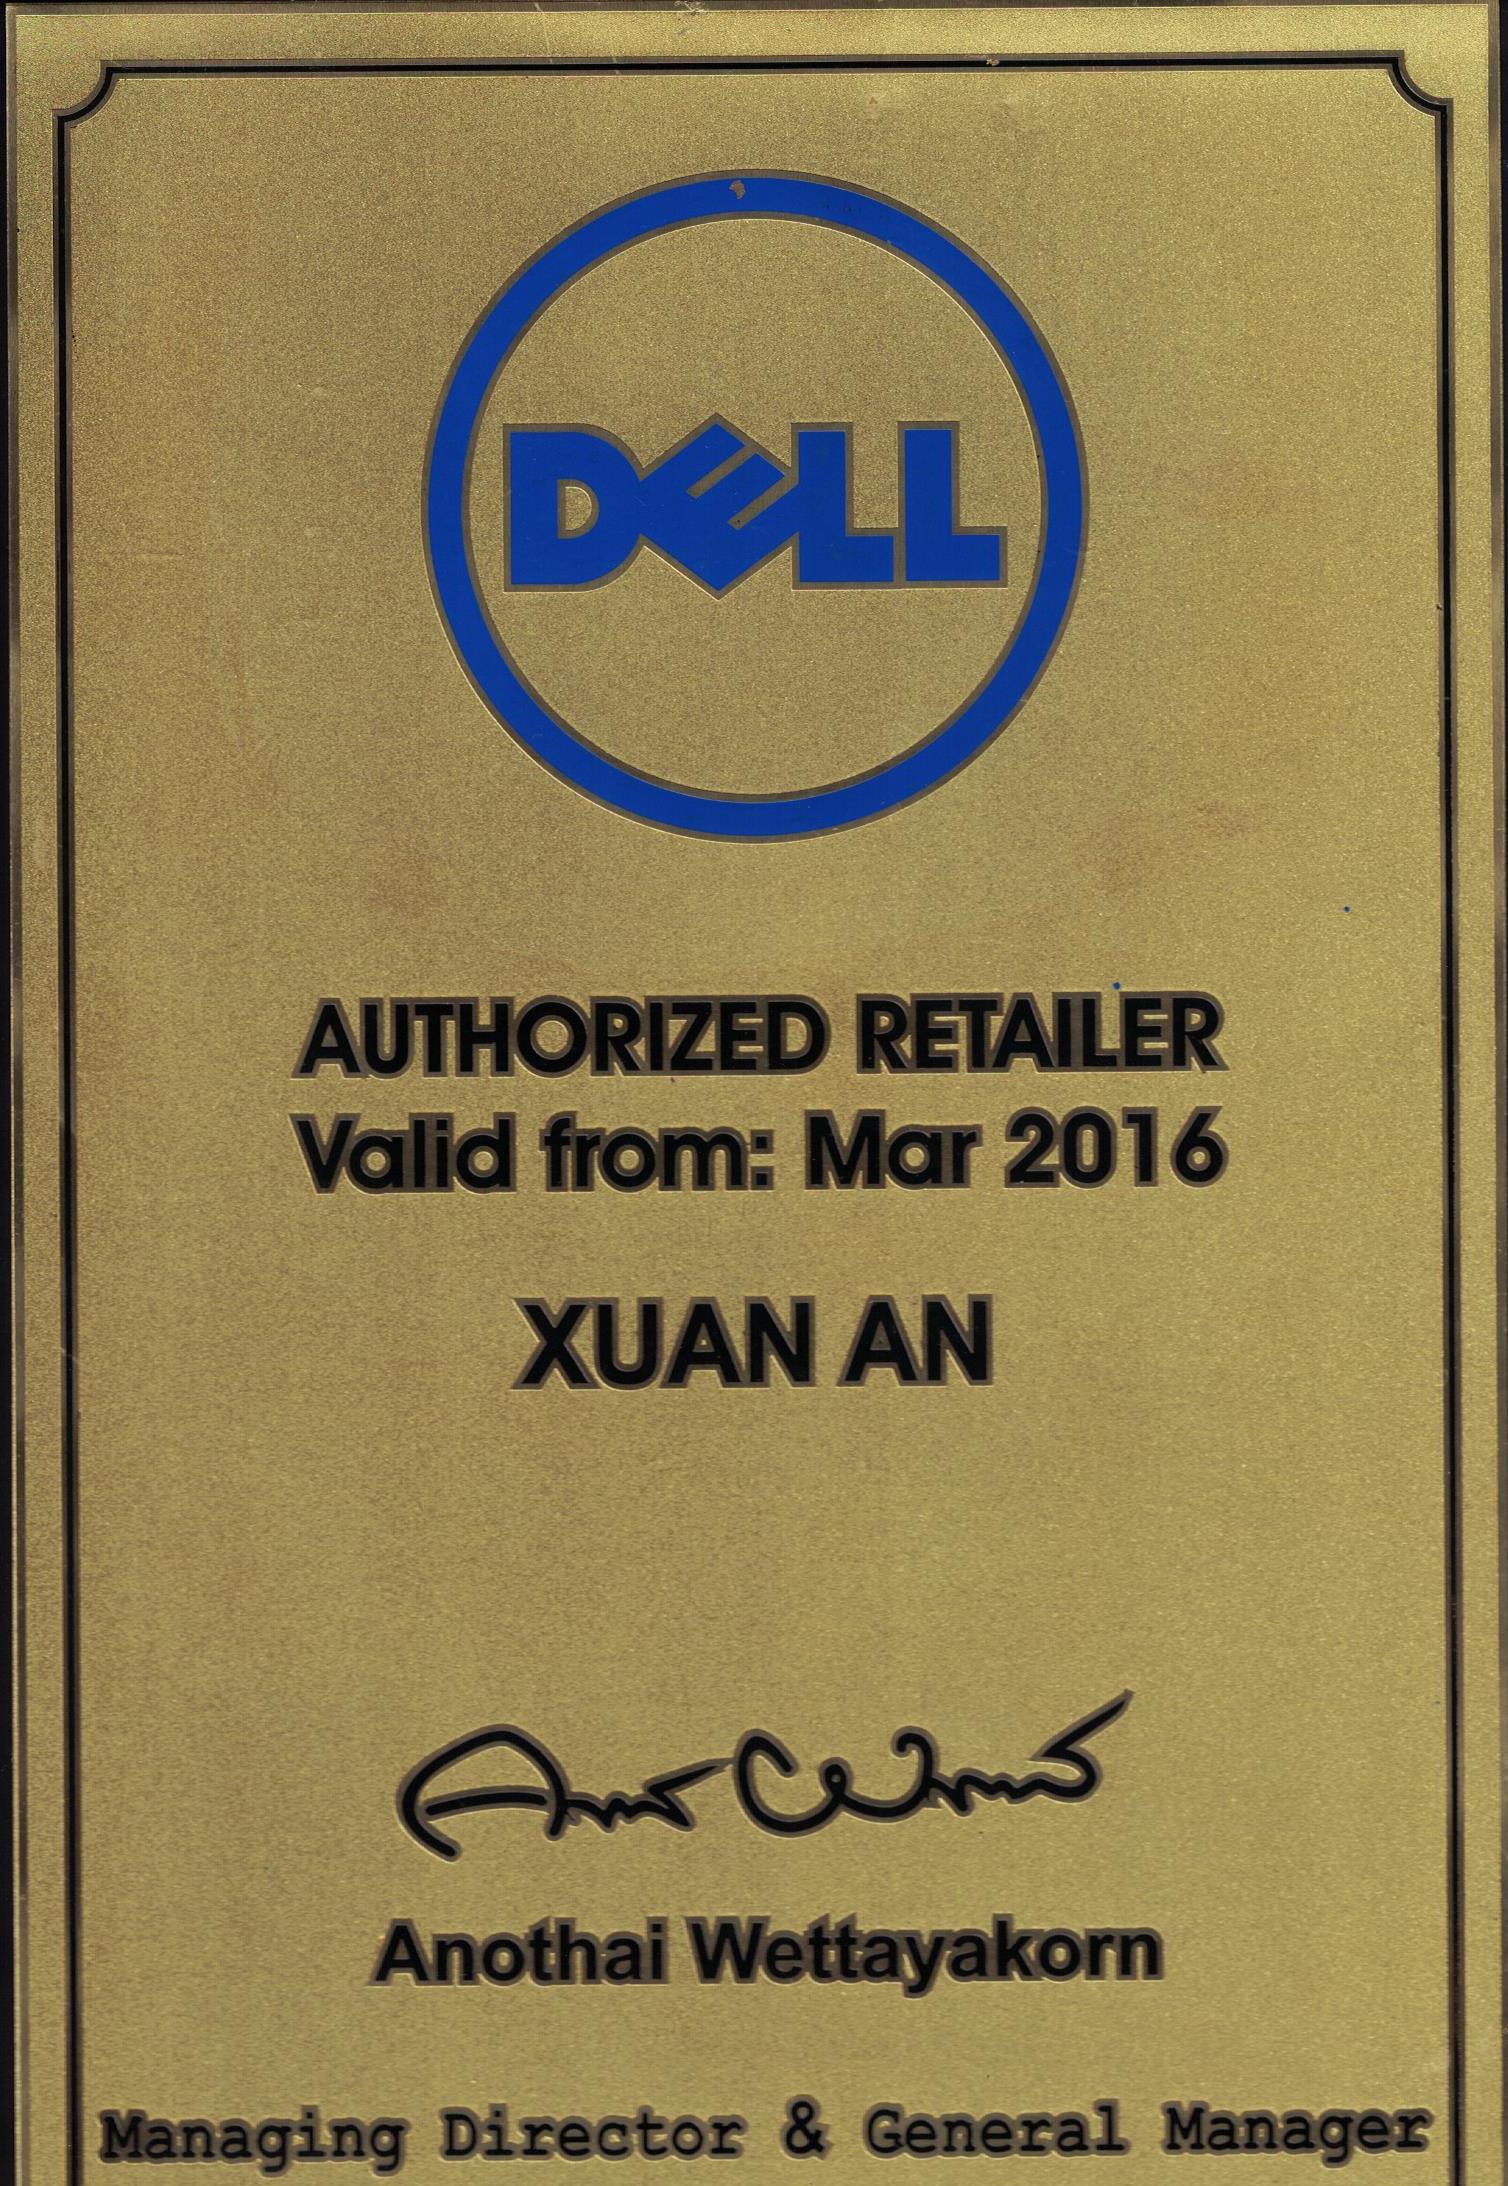 Dell XPS 13 9300 - 70217873 (Silver)